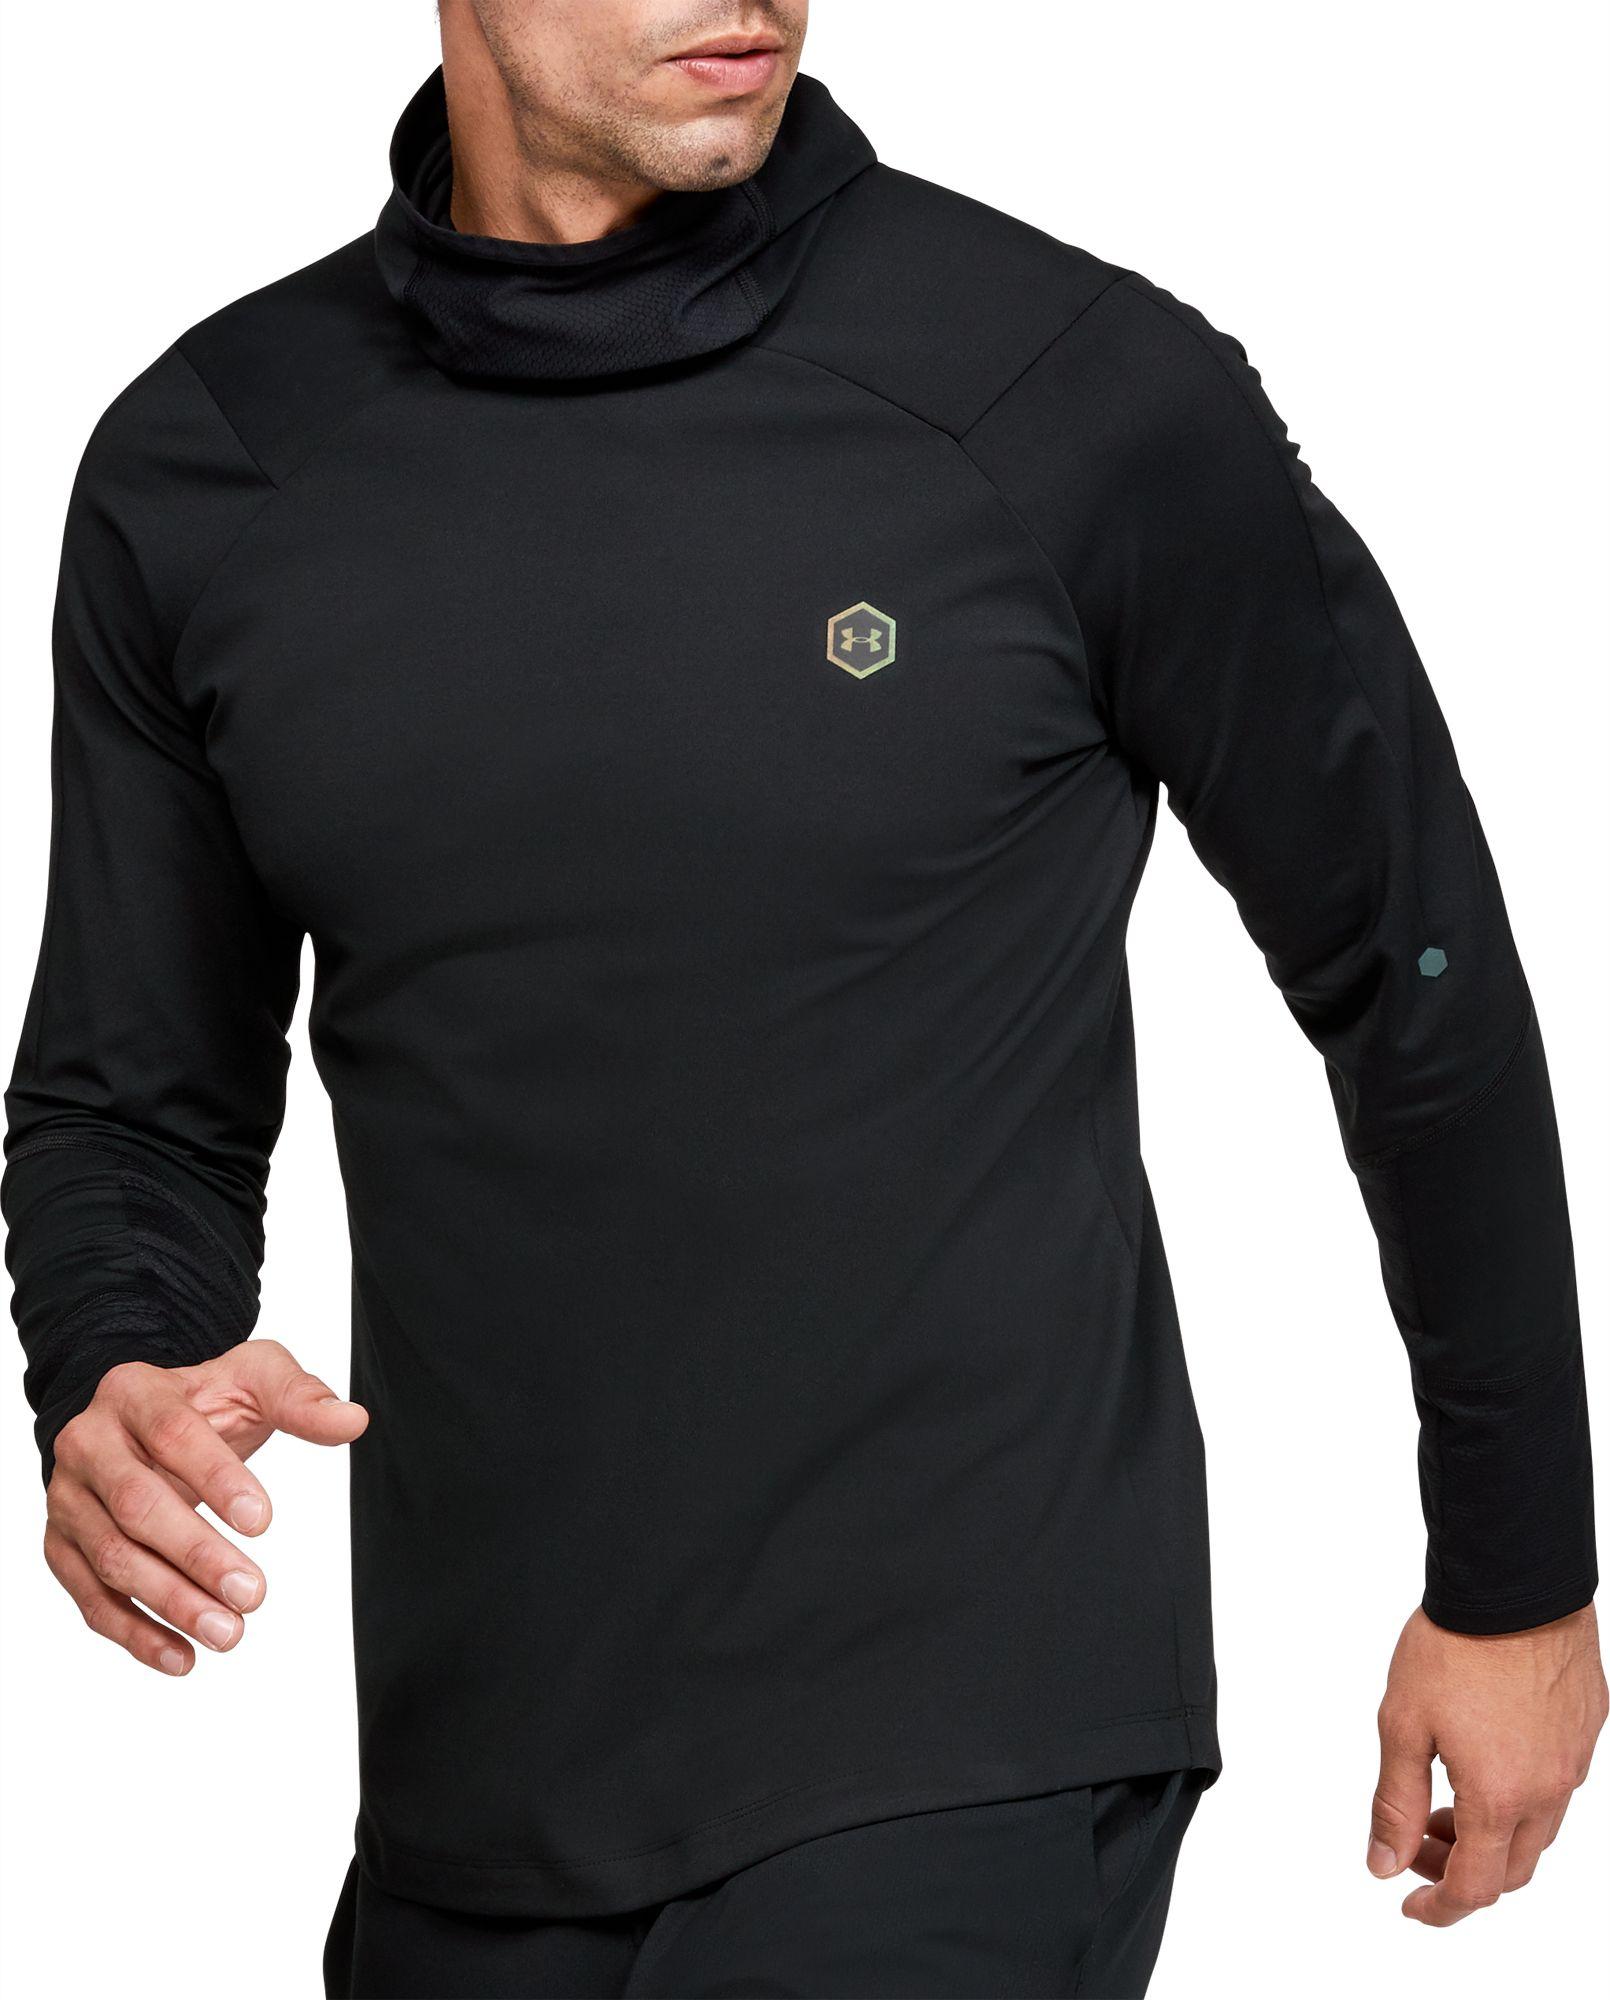 Under Armour Men's ColdGear RUSH Hooded Long Sleeve Shirt, Size: Small, Black thumbnail